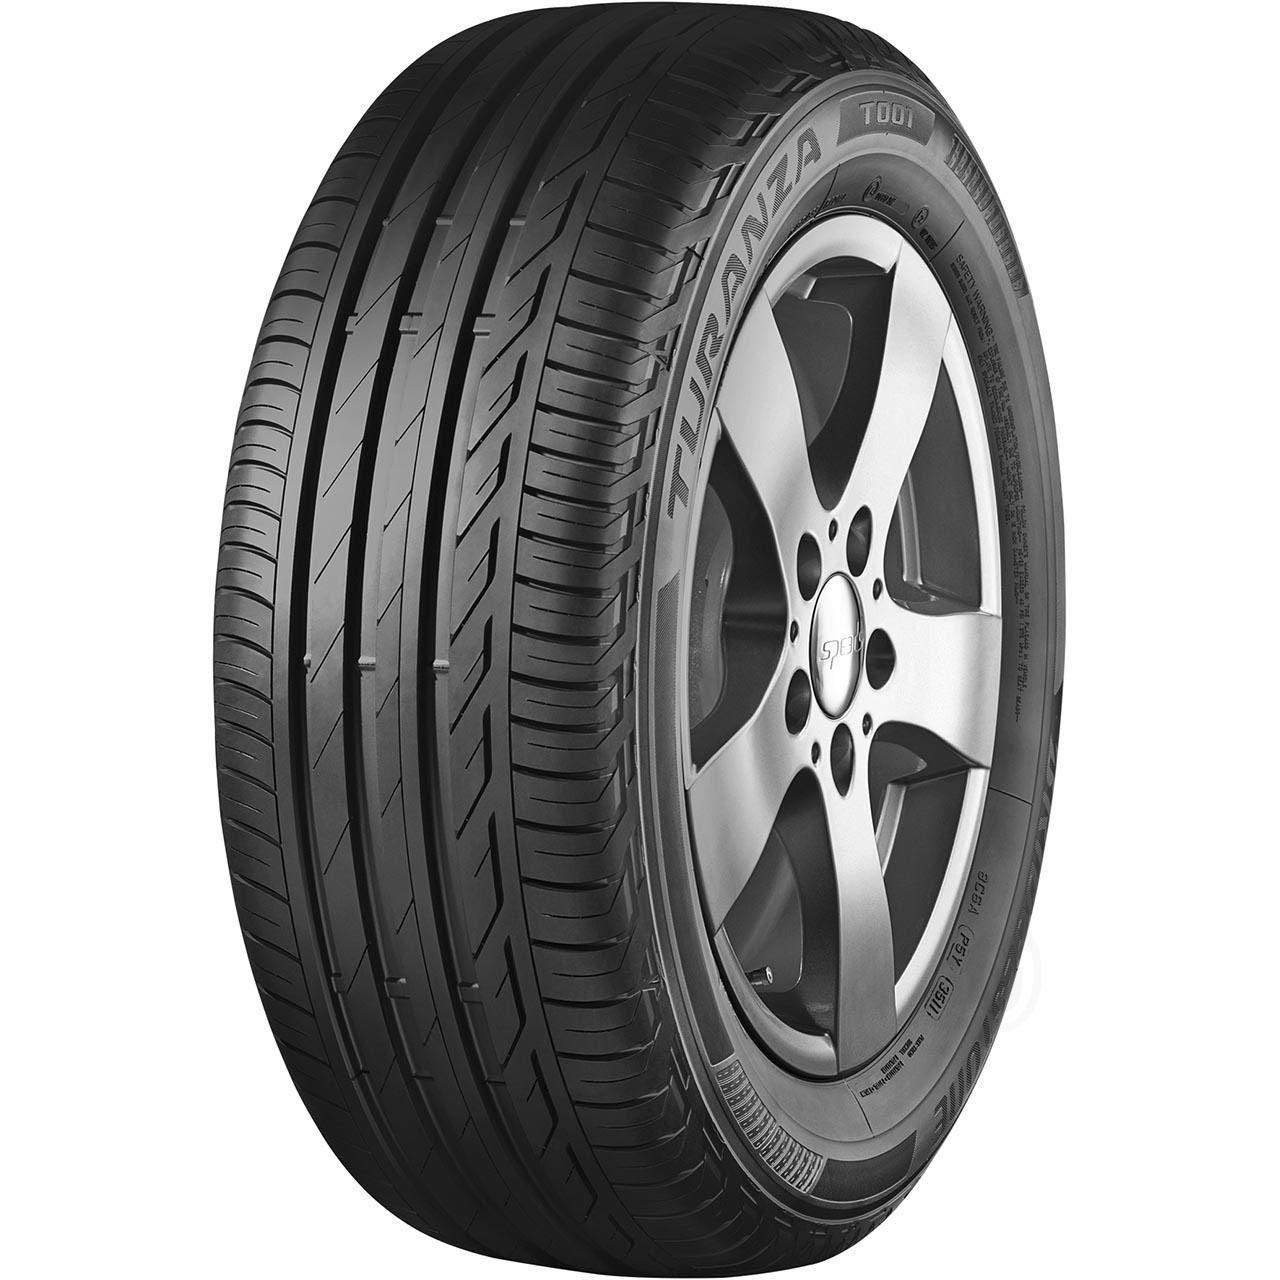 B//A//71dB Bridgestone T001 TURANZA Autovetture Pneumatici Estivi 71//50//R17 91H